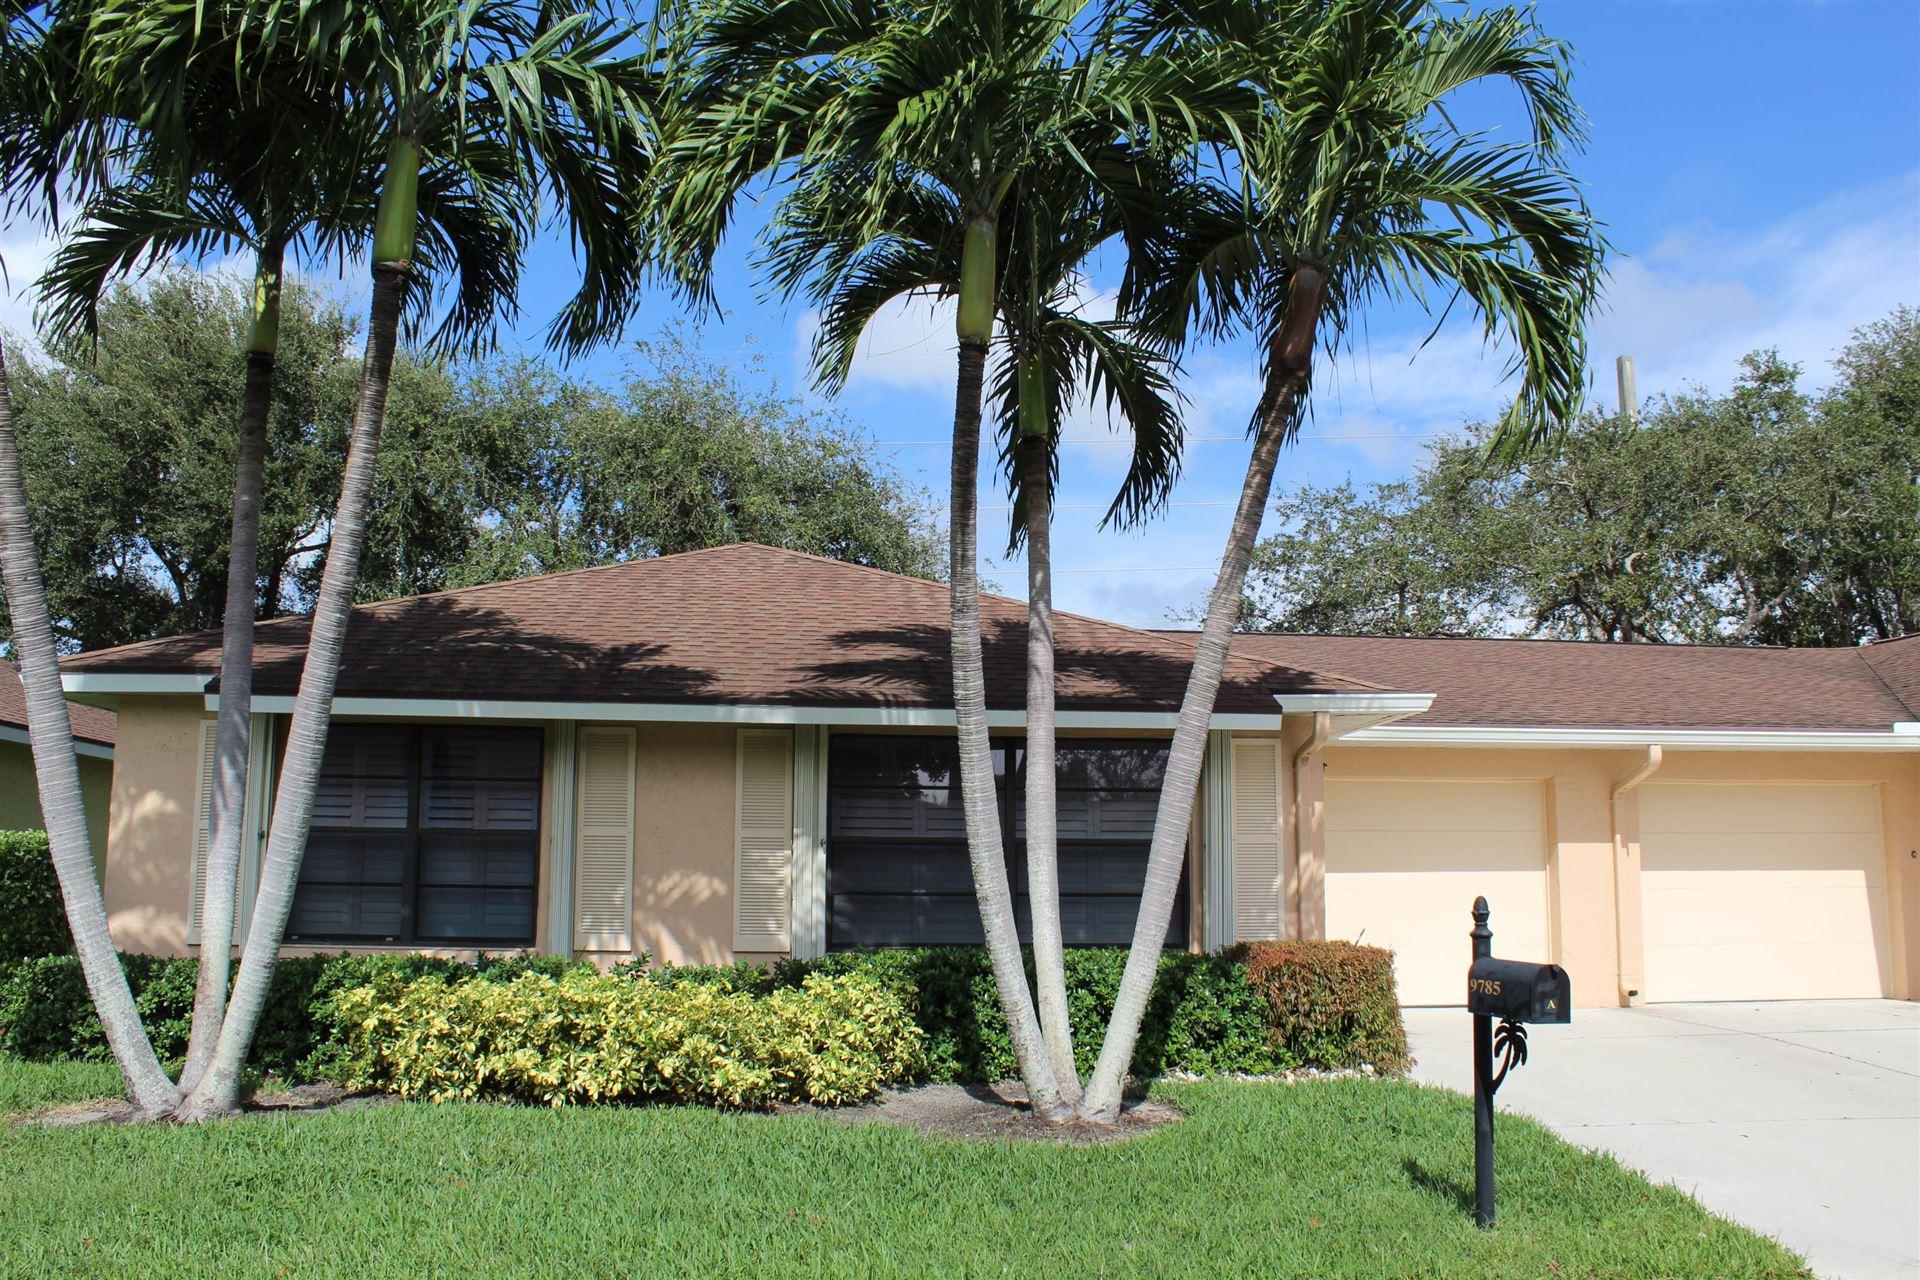 Photo of 9785 Tabebuia Tree Drive #A, Boynton Beach, FL 33436 (MLS # RX-10670338)